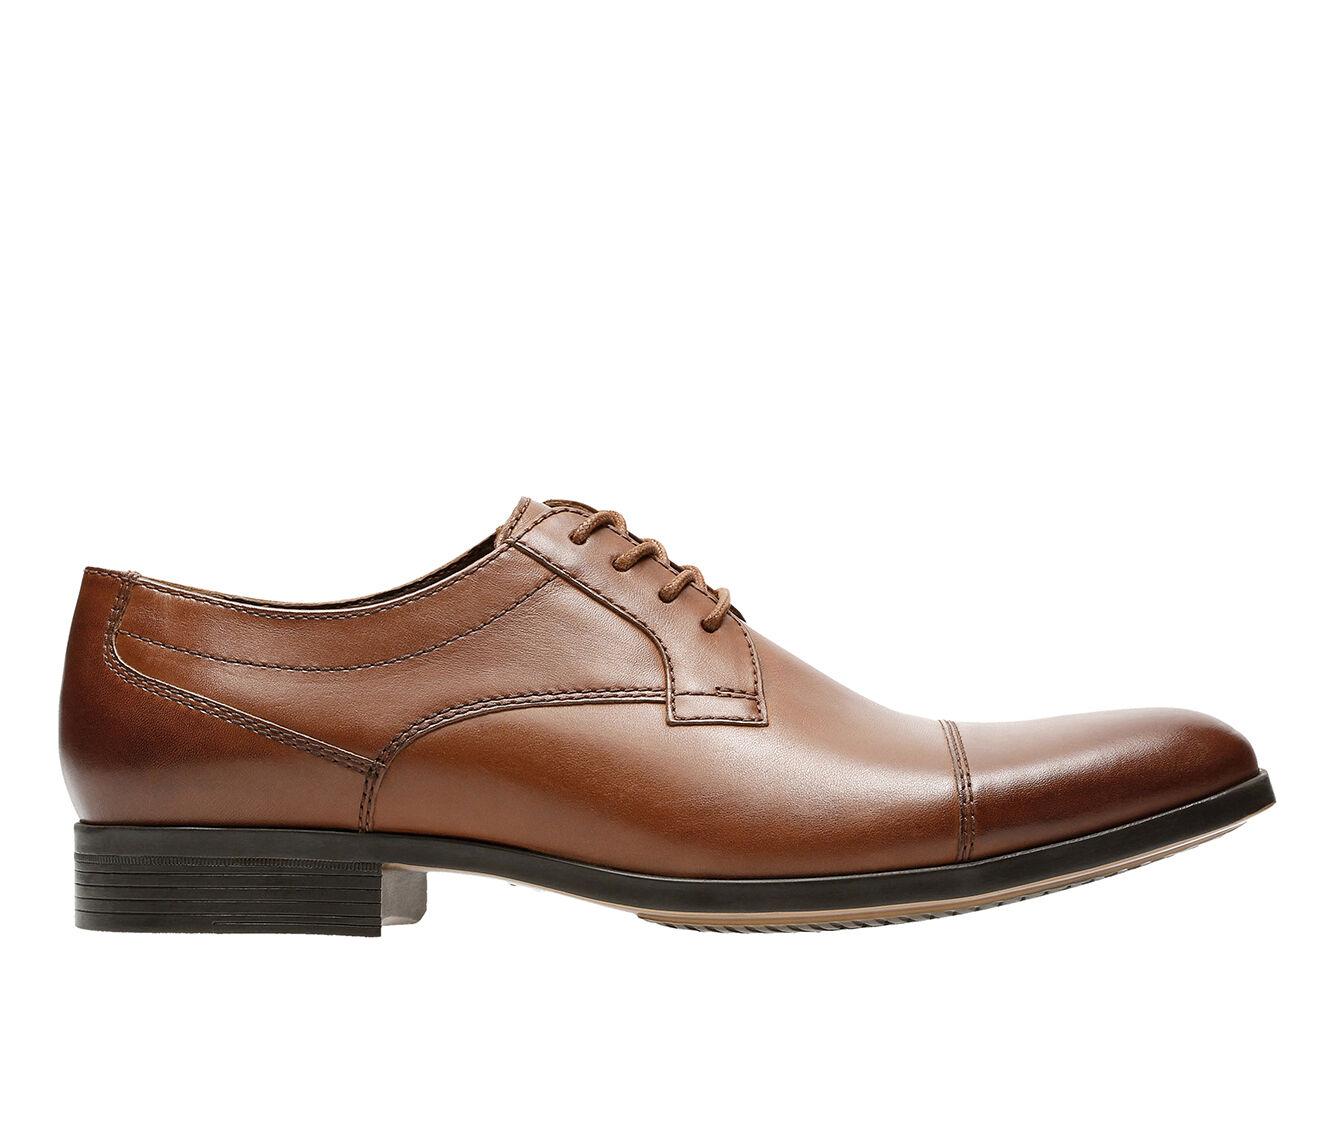 Men's Clarks Conwell Cap Dress Shoes Tan